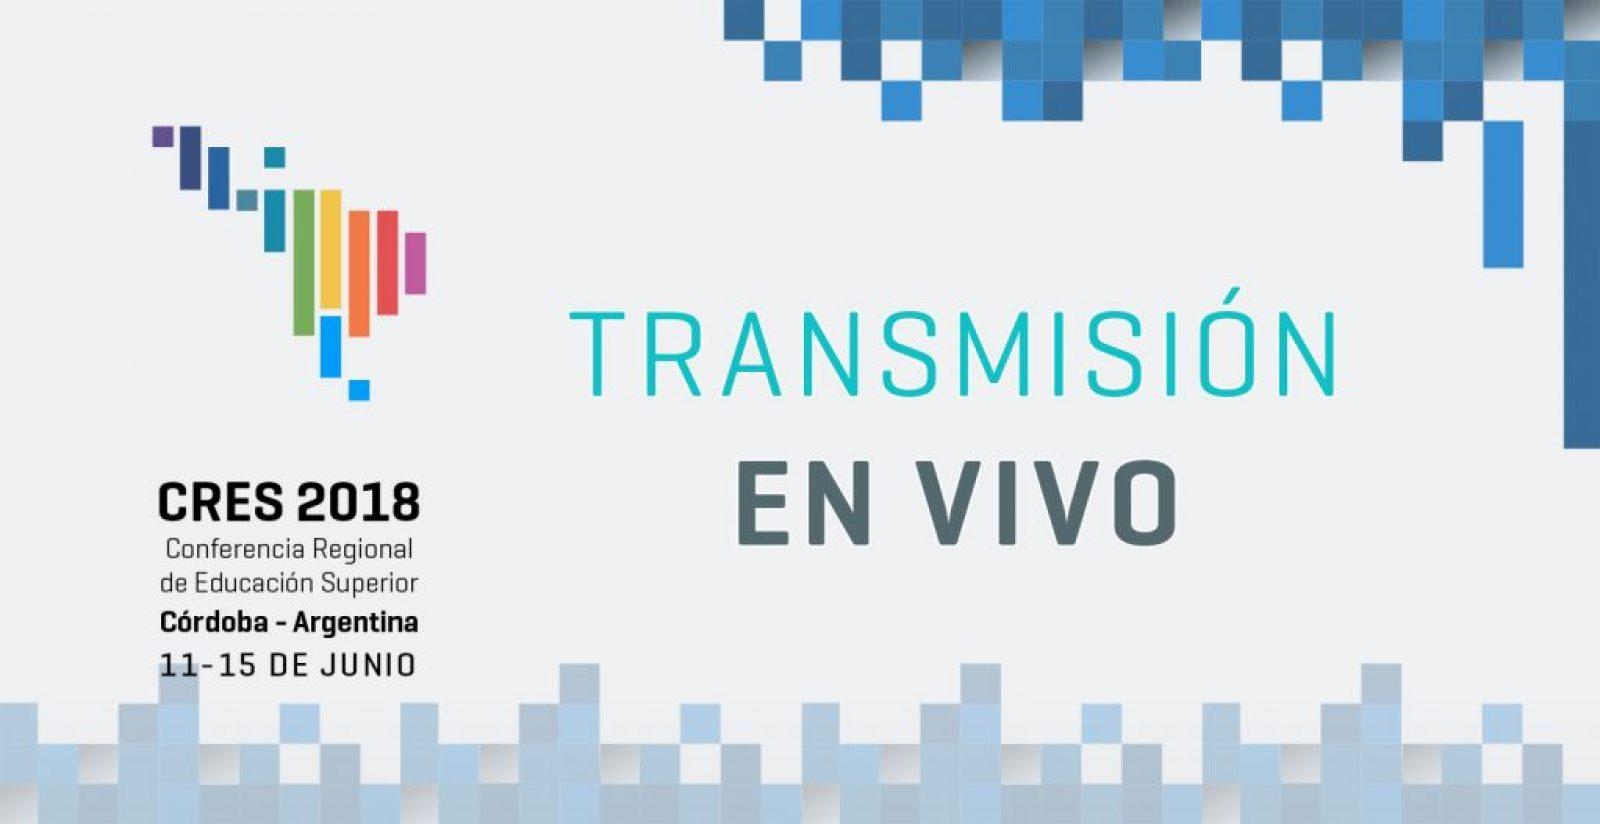 CRES2018-transmision-en-vivo